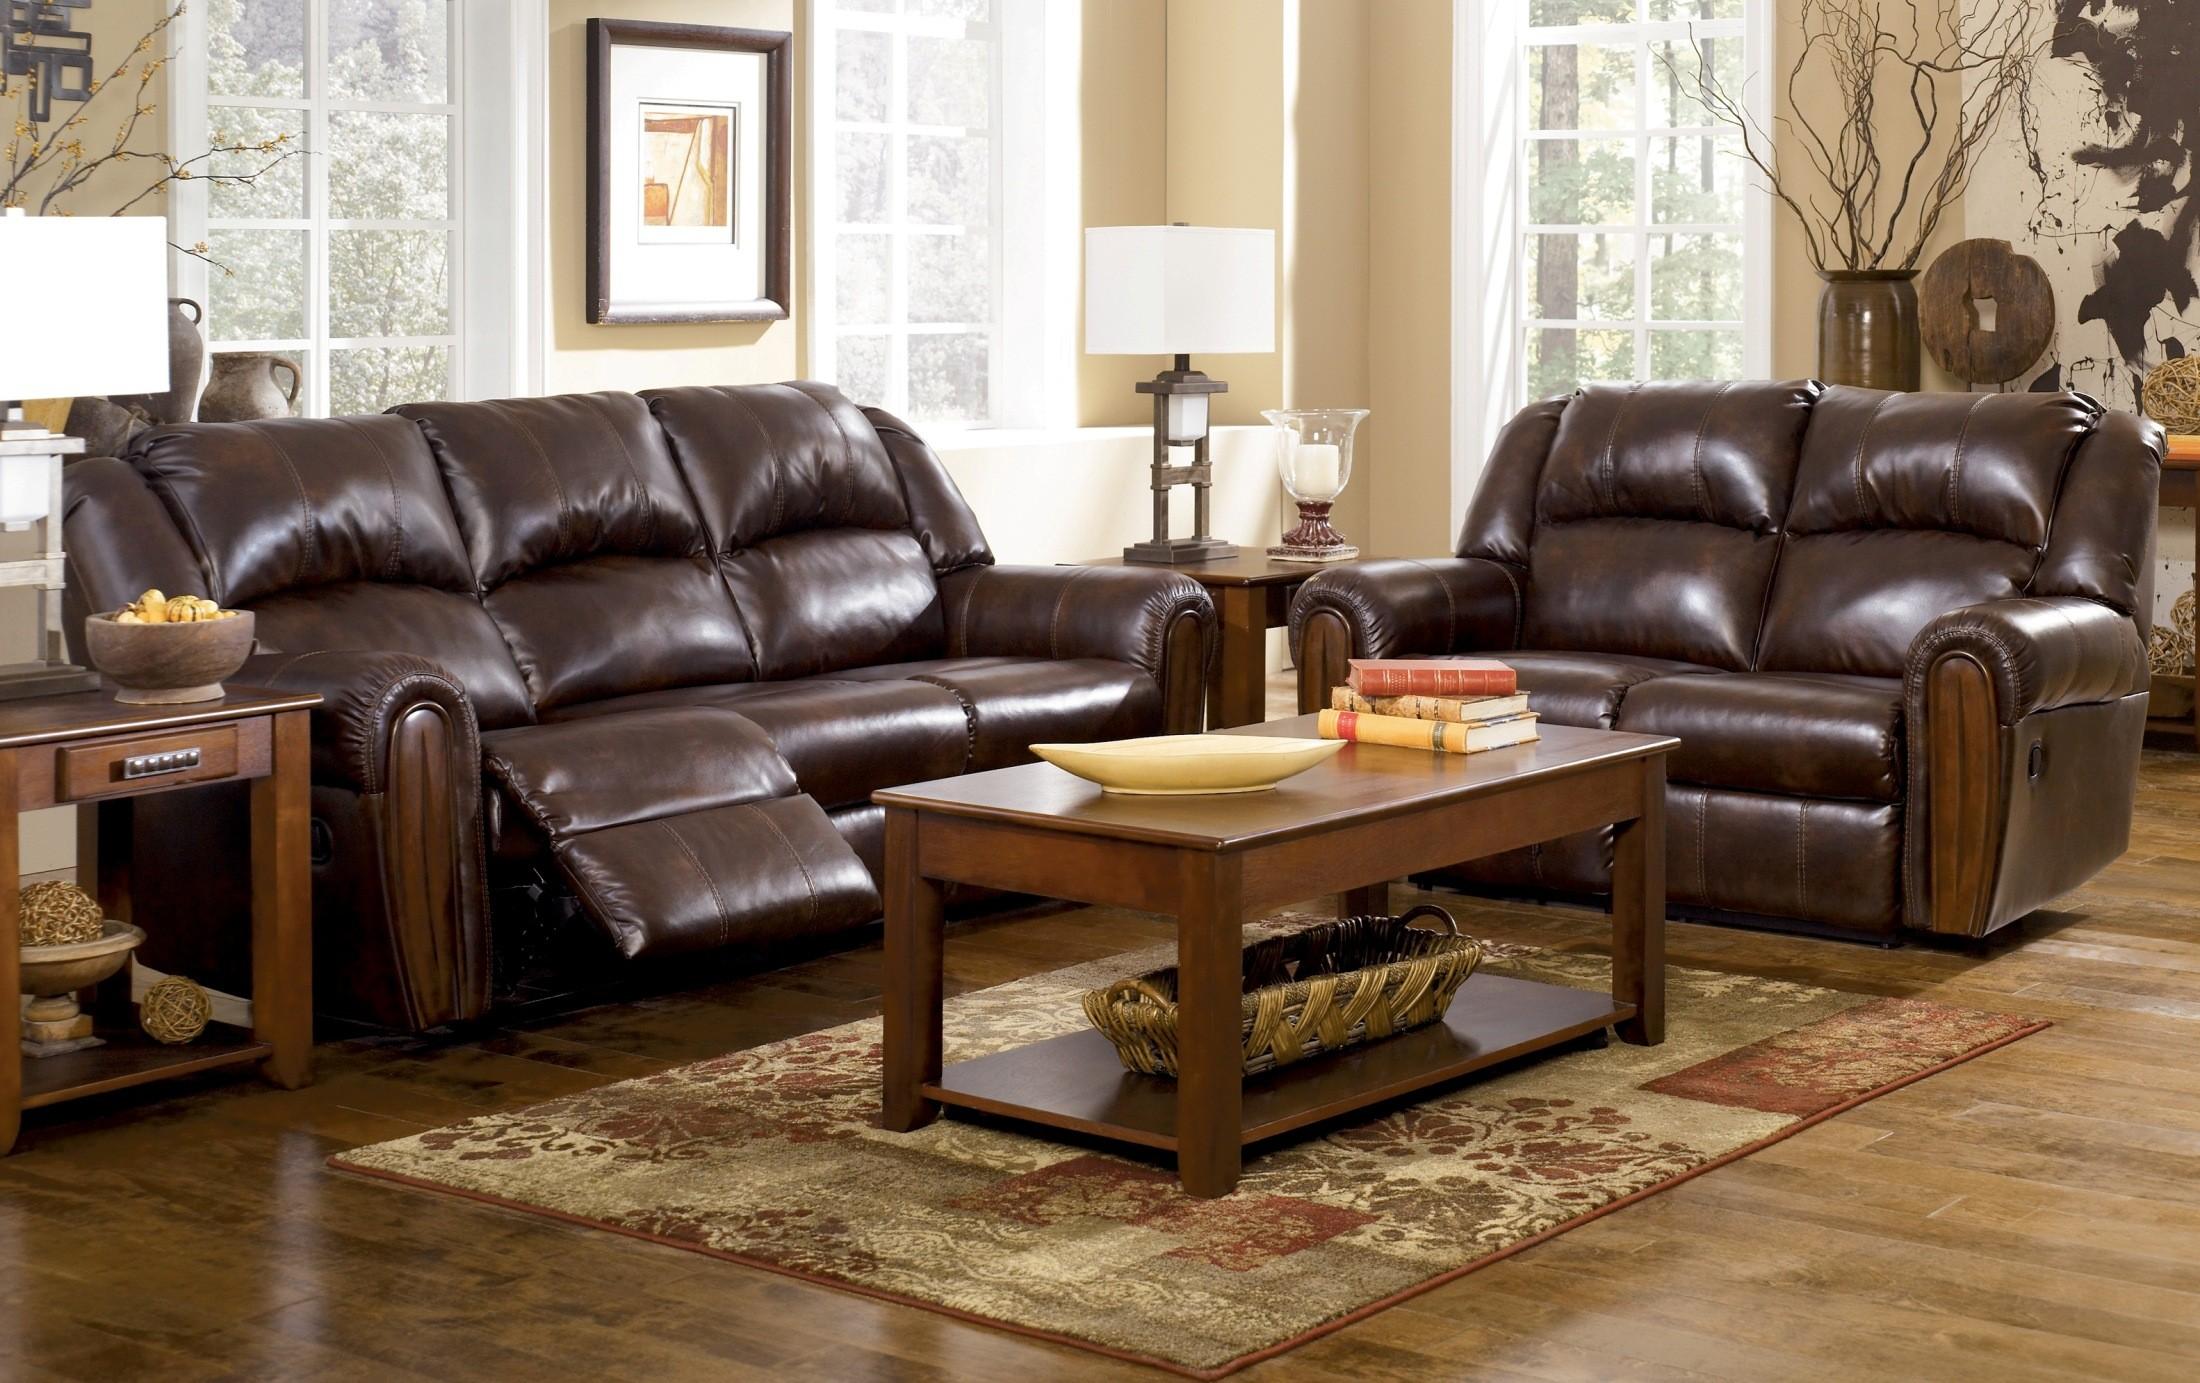 Woodsdale DuraBlend Antique Living Room Set From Ashley 96300 Coleman Fur